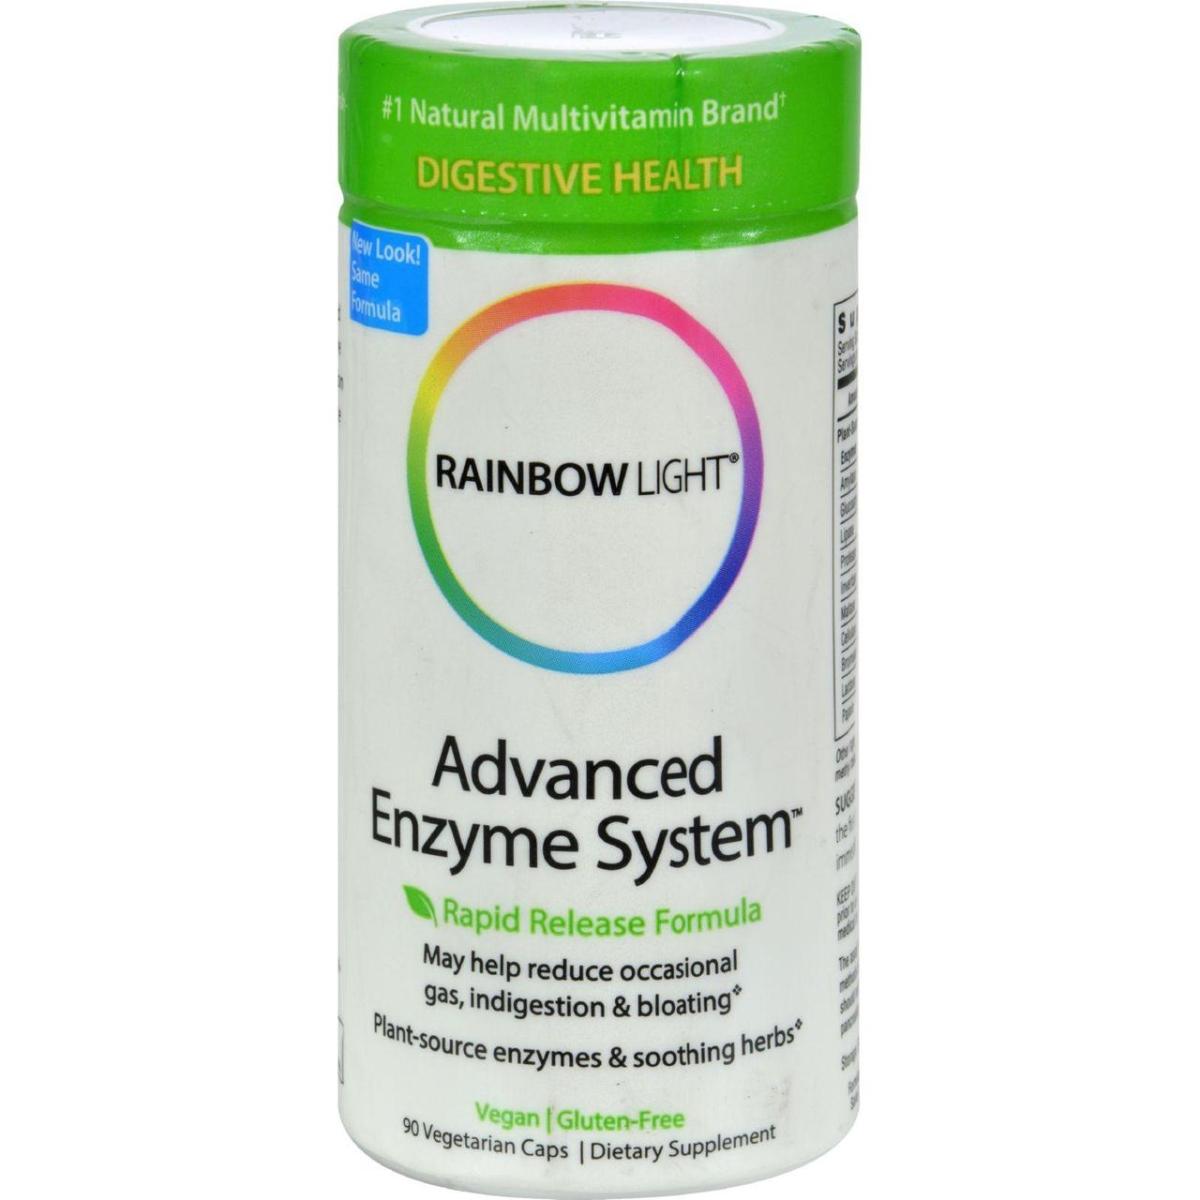 Rainbow Light HG0370320 Advanced Enzyme System - 90 Vegetarian Capsules